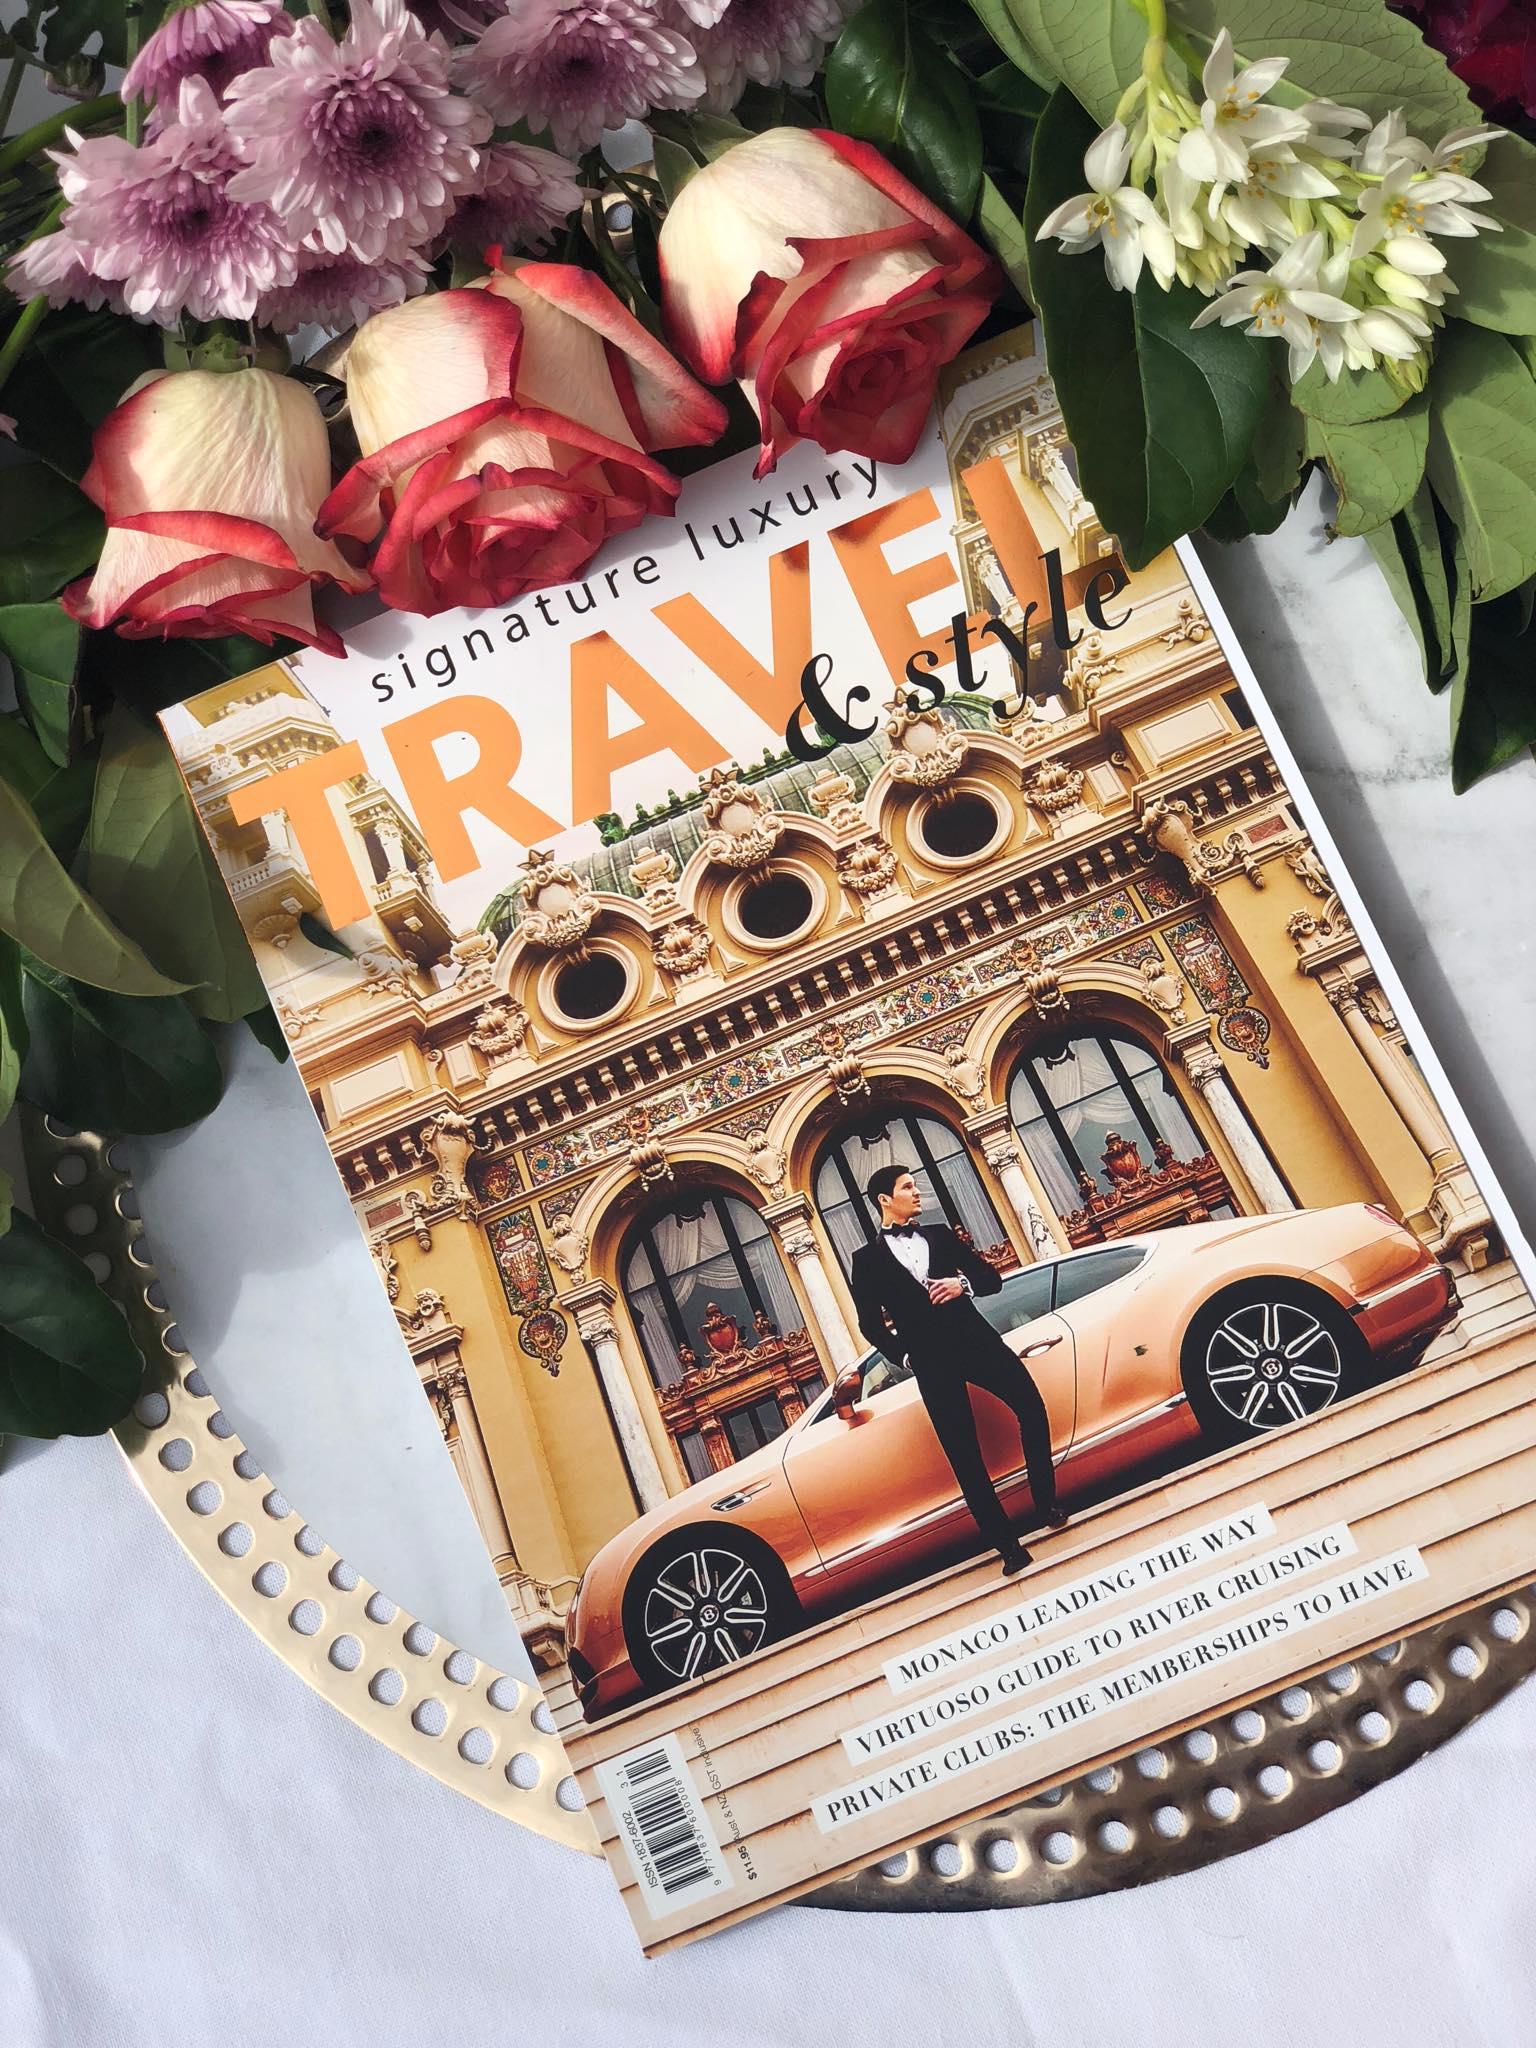 Signature Luxury Travel & Style volume 31